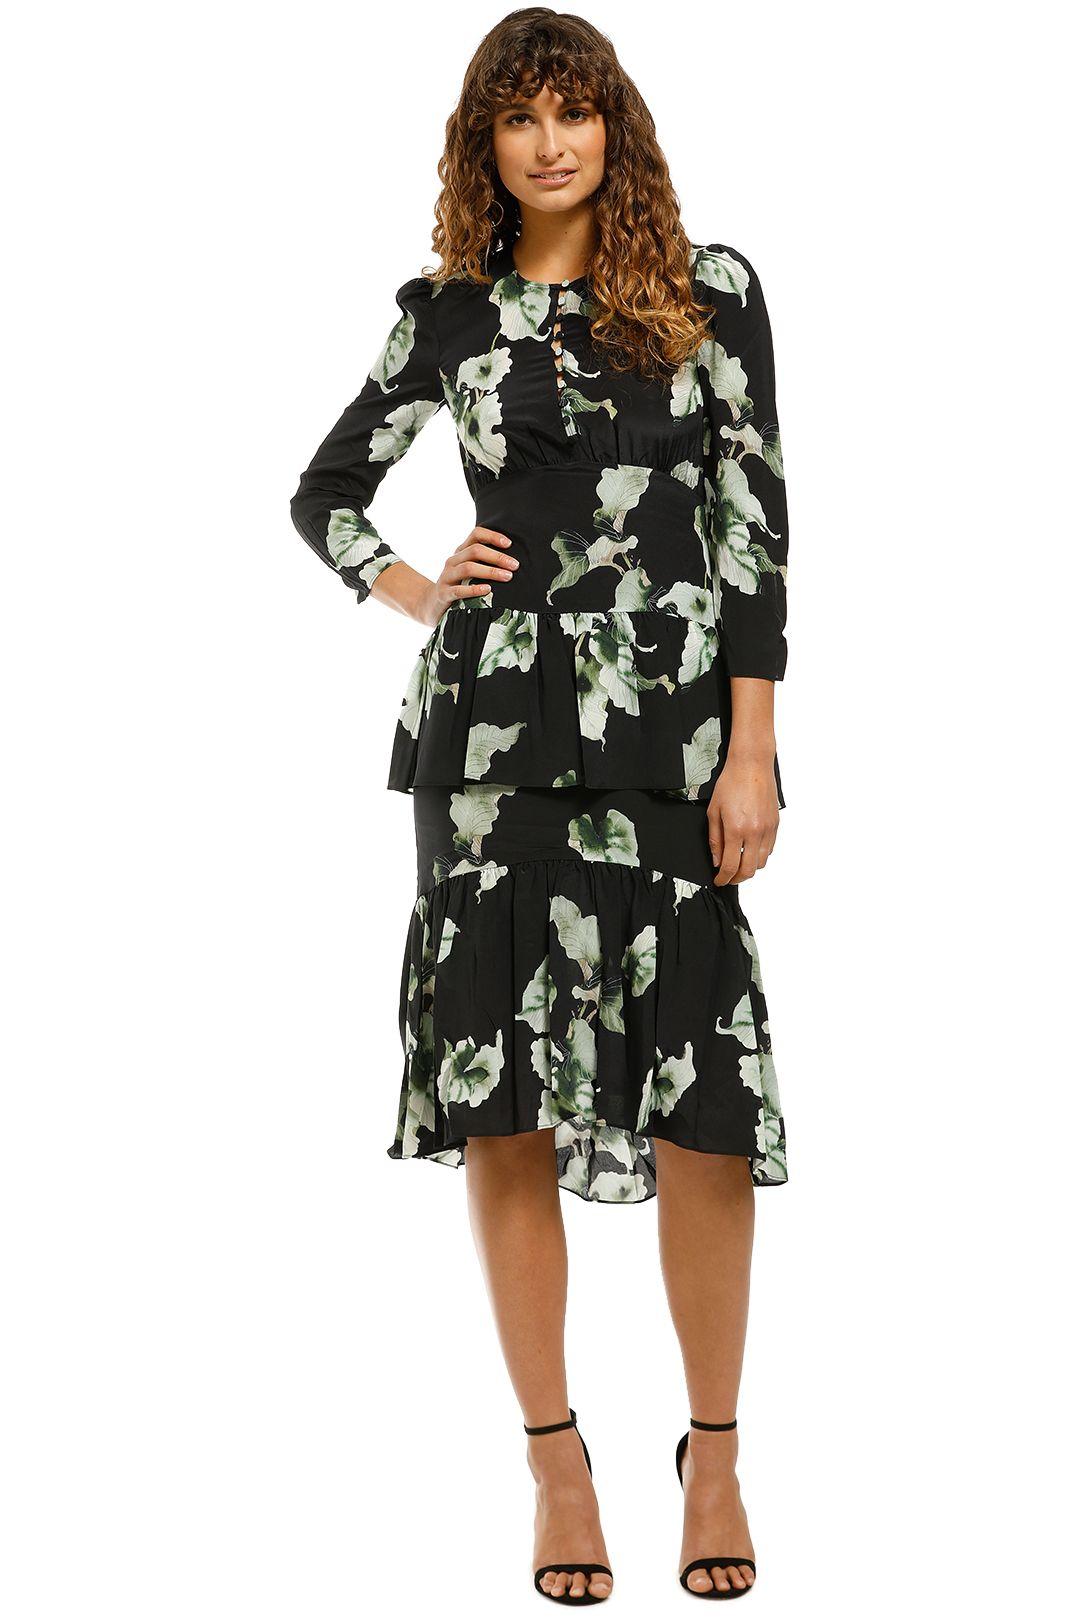 Husk-Amazon-Dress-Leaf-Print-Front